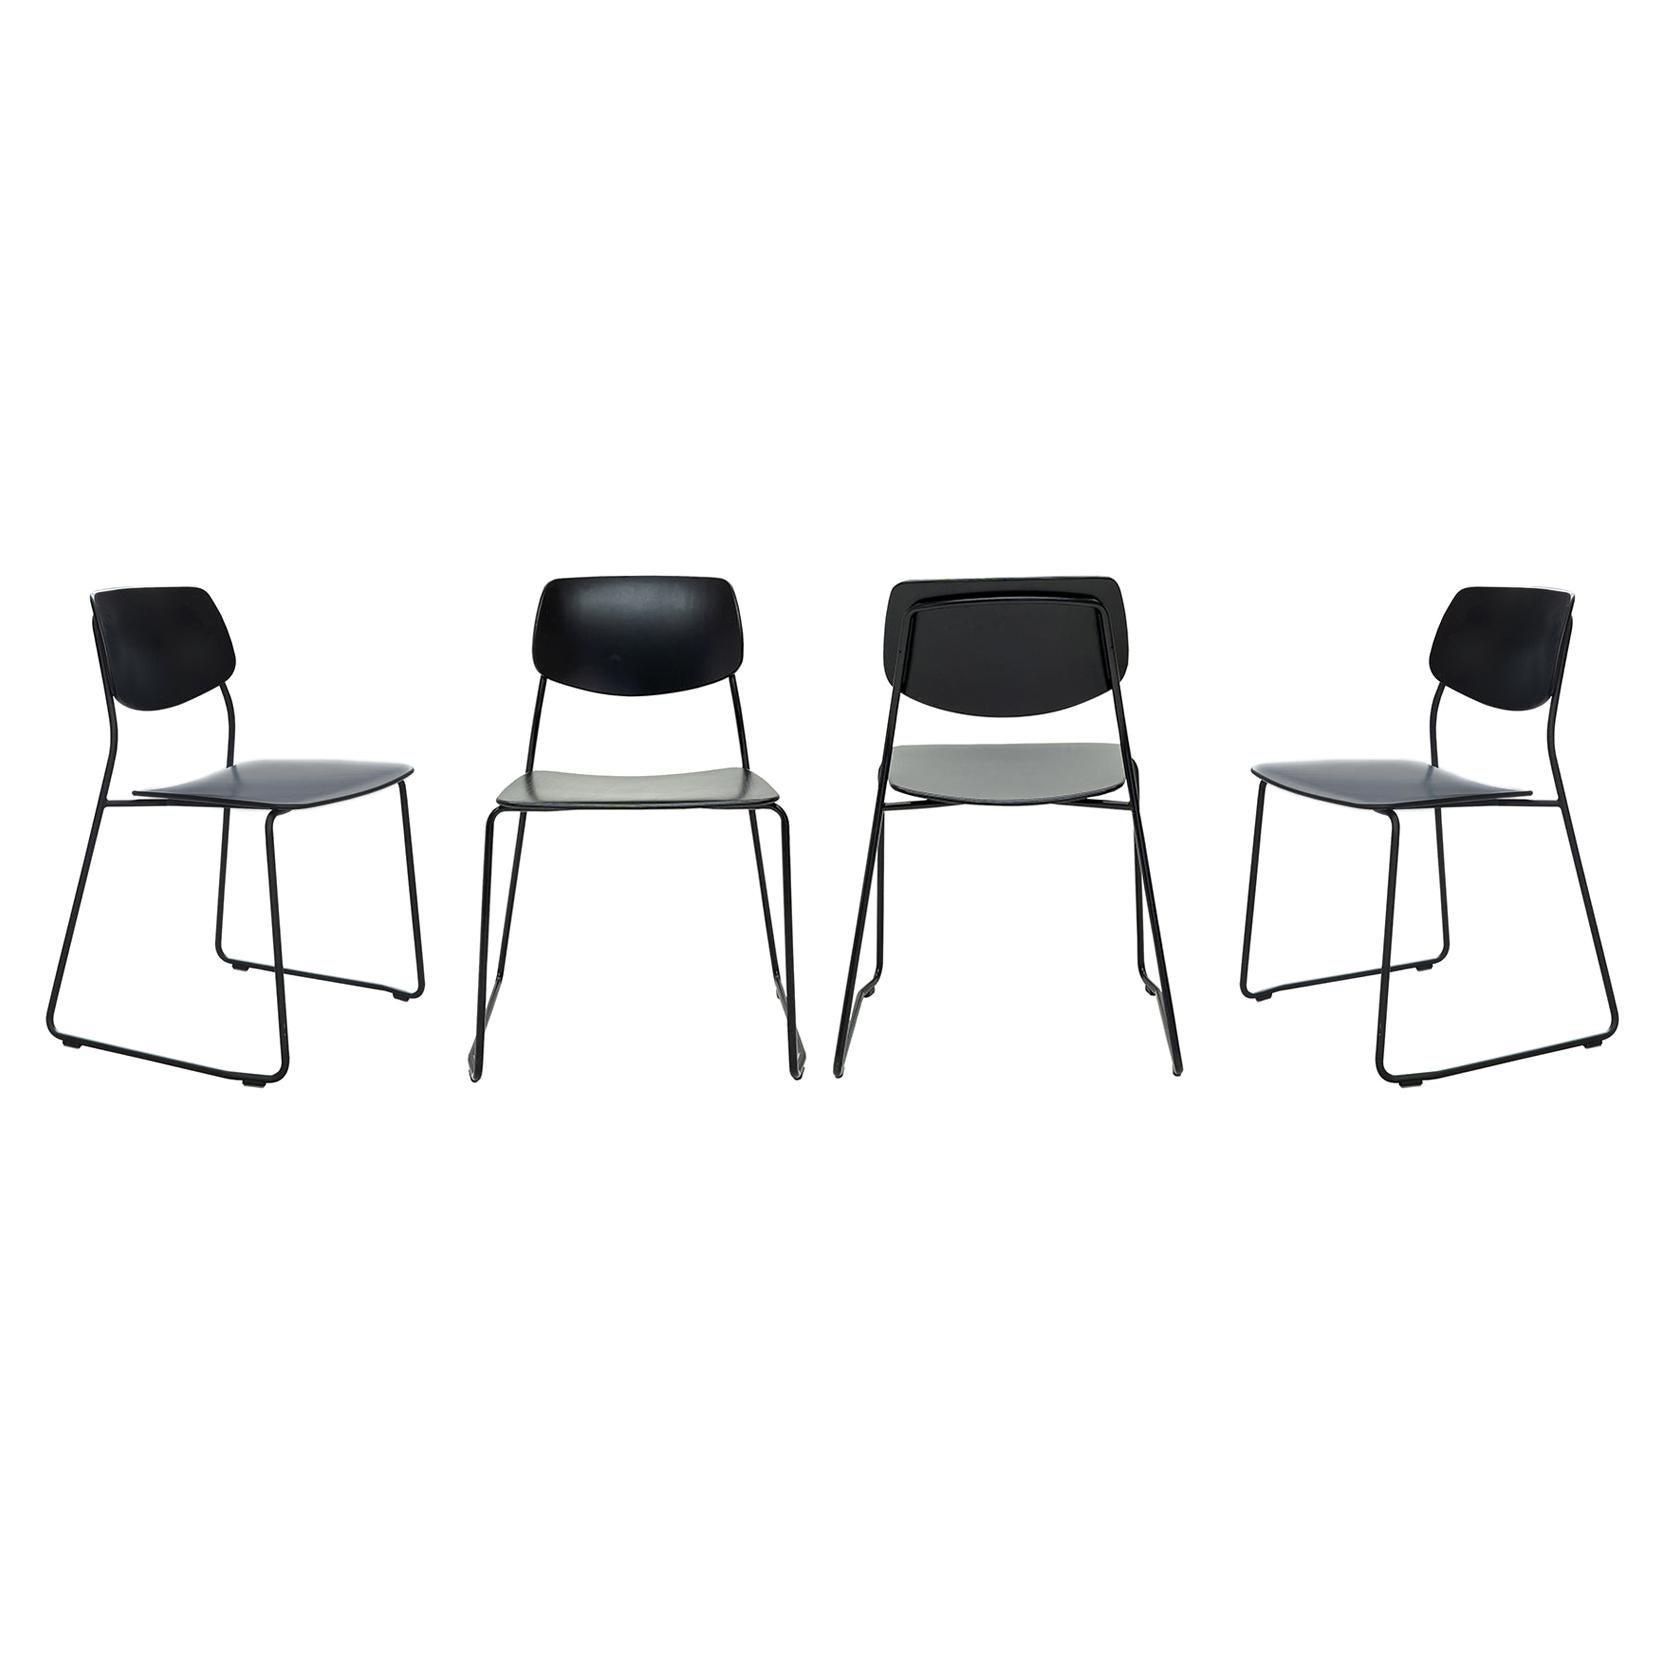 Dietiker Felber C14 Sled Dining Chair, Modular Design, Set of 4